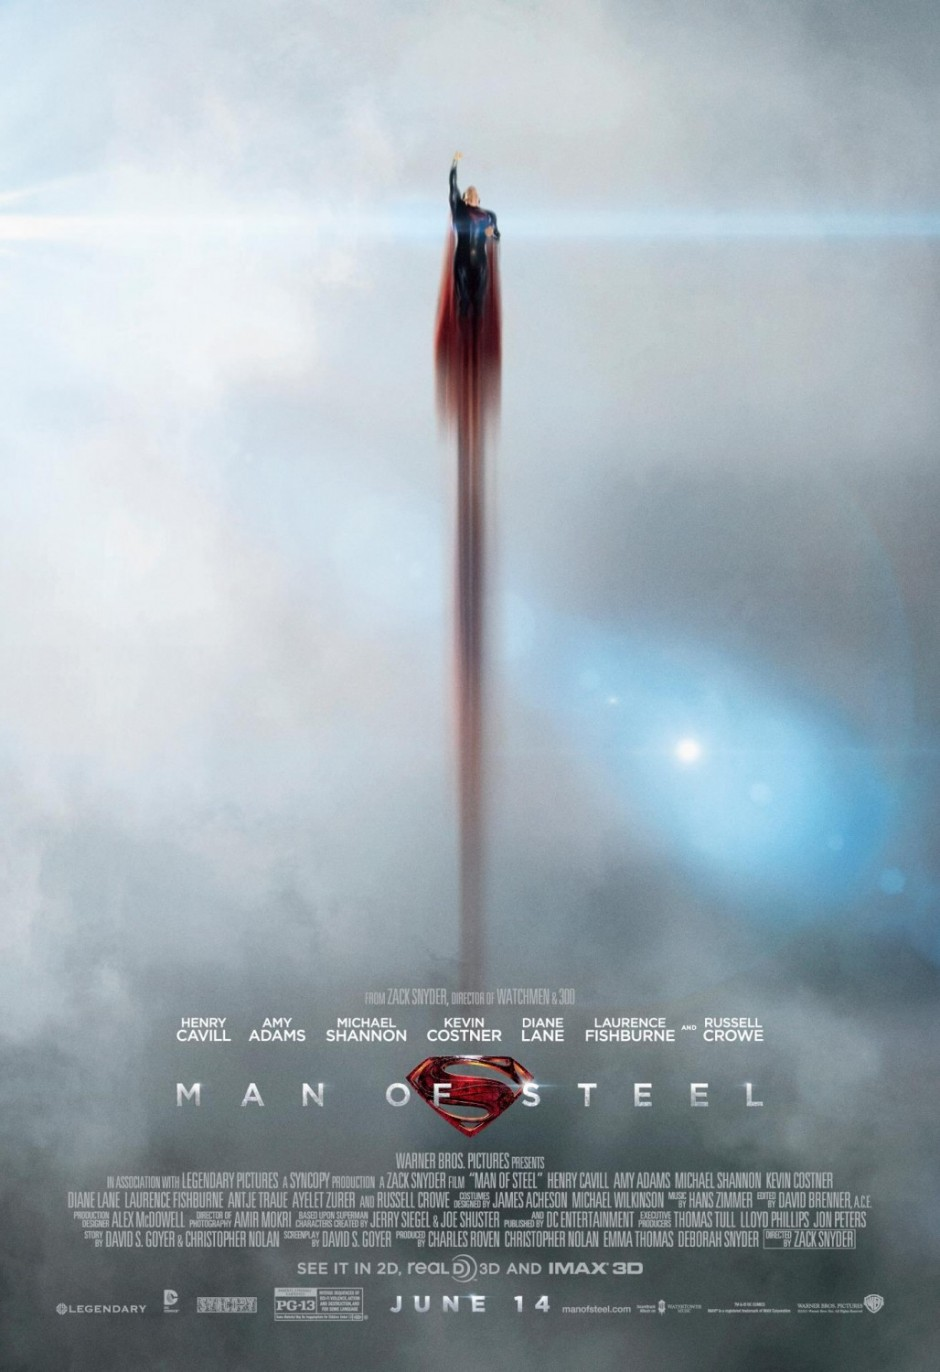 Man-of-Steel-2013-Movie-Poster3-e1368399169706.jpg